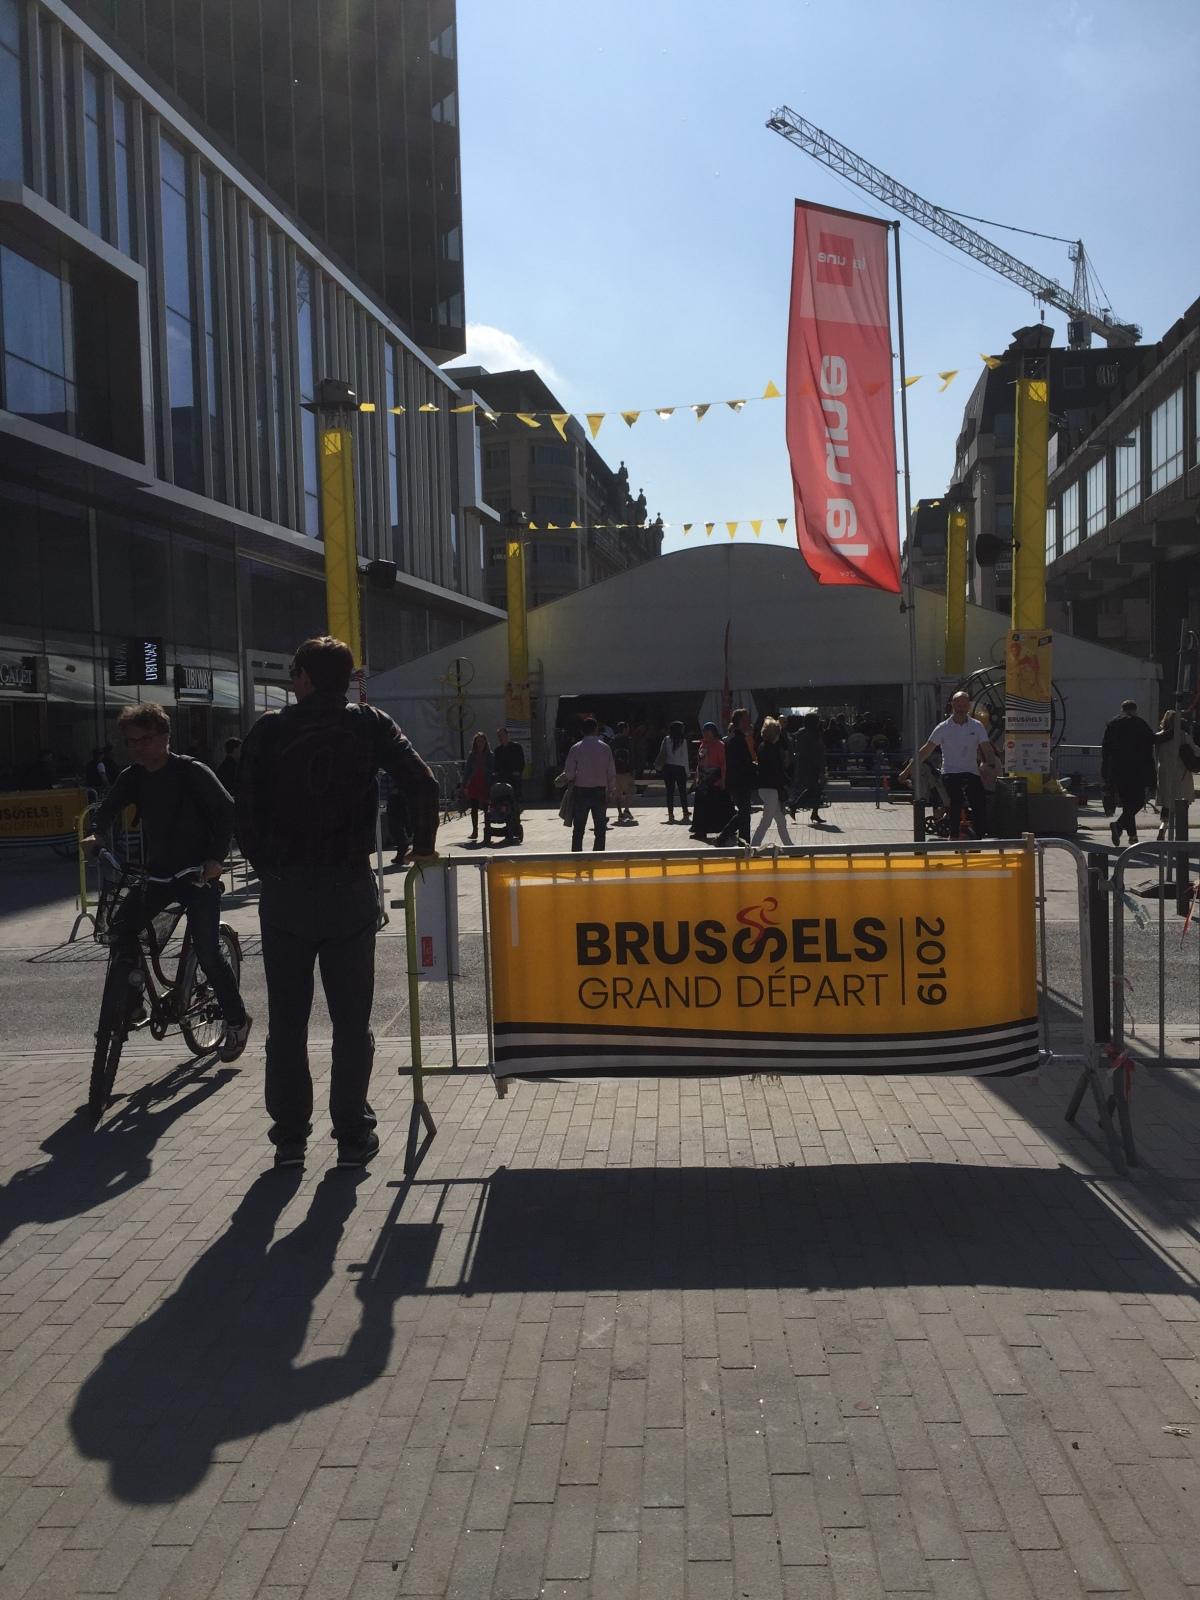 Moving on from Bruges toBrussels